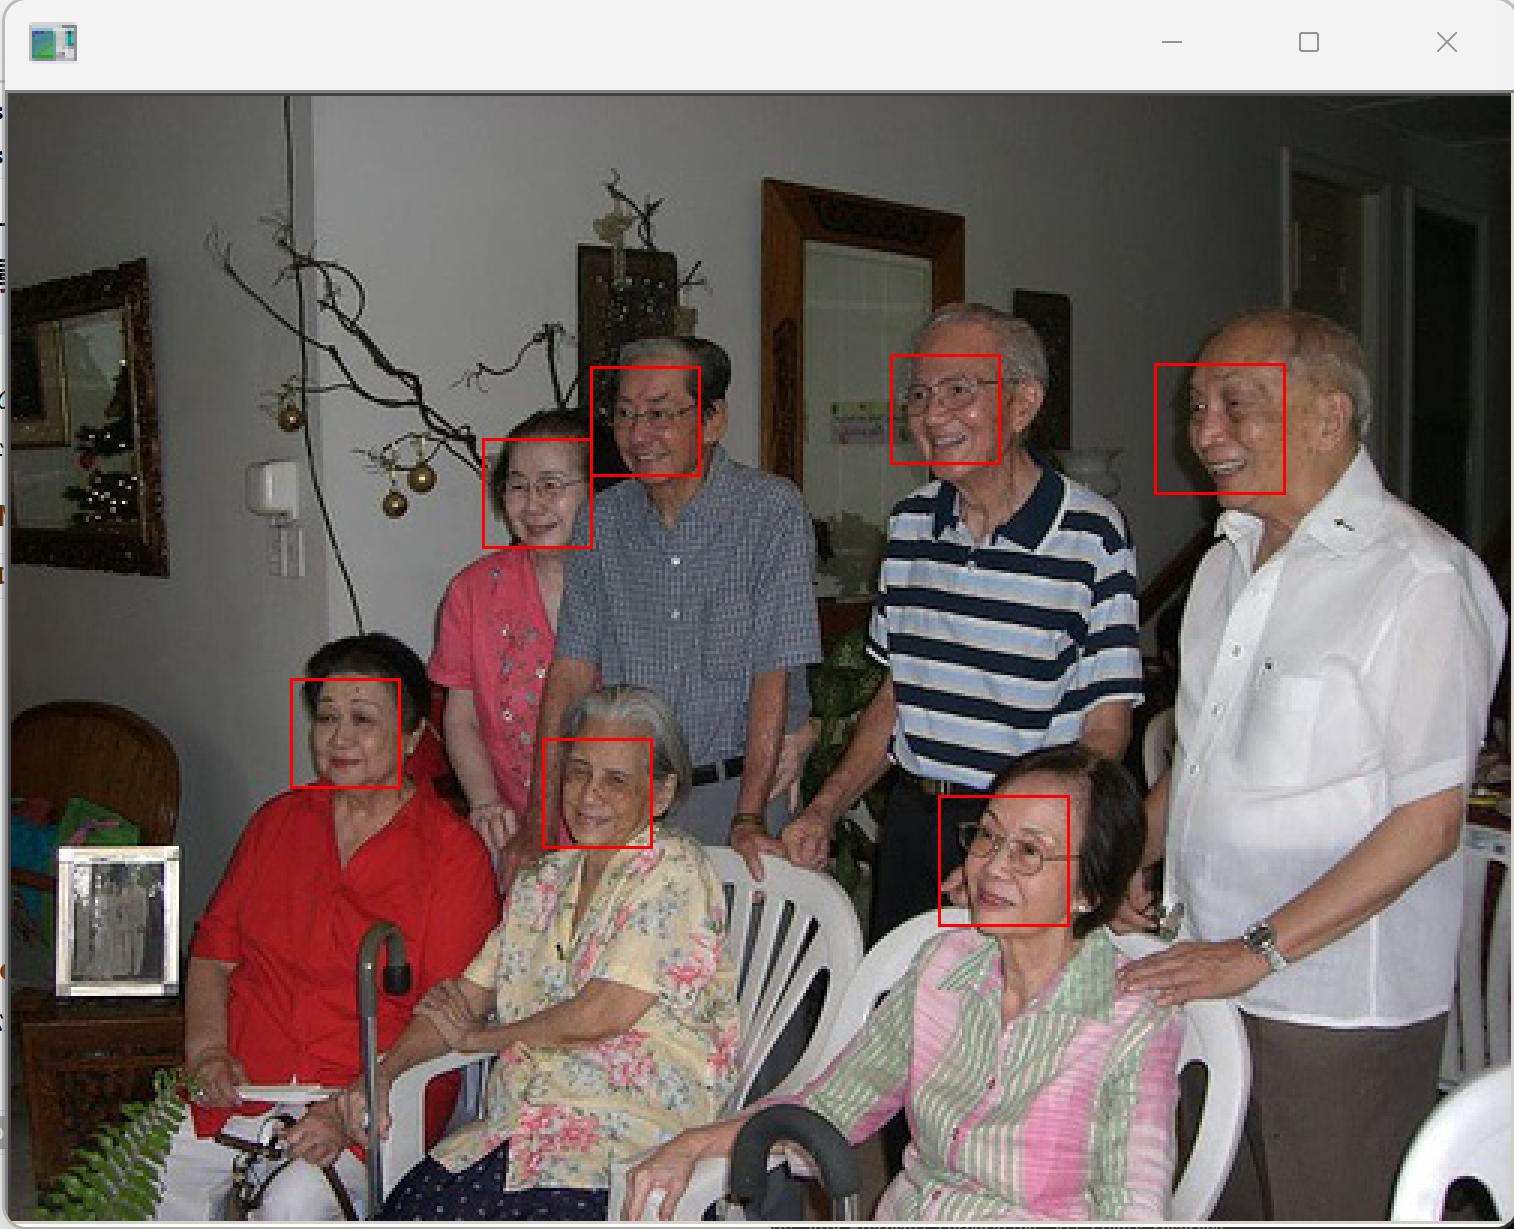 Dlib で,顔検出,顔のランドマーク検知(68ランドマーク法